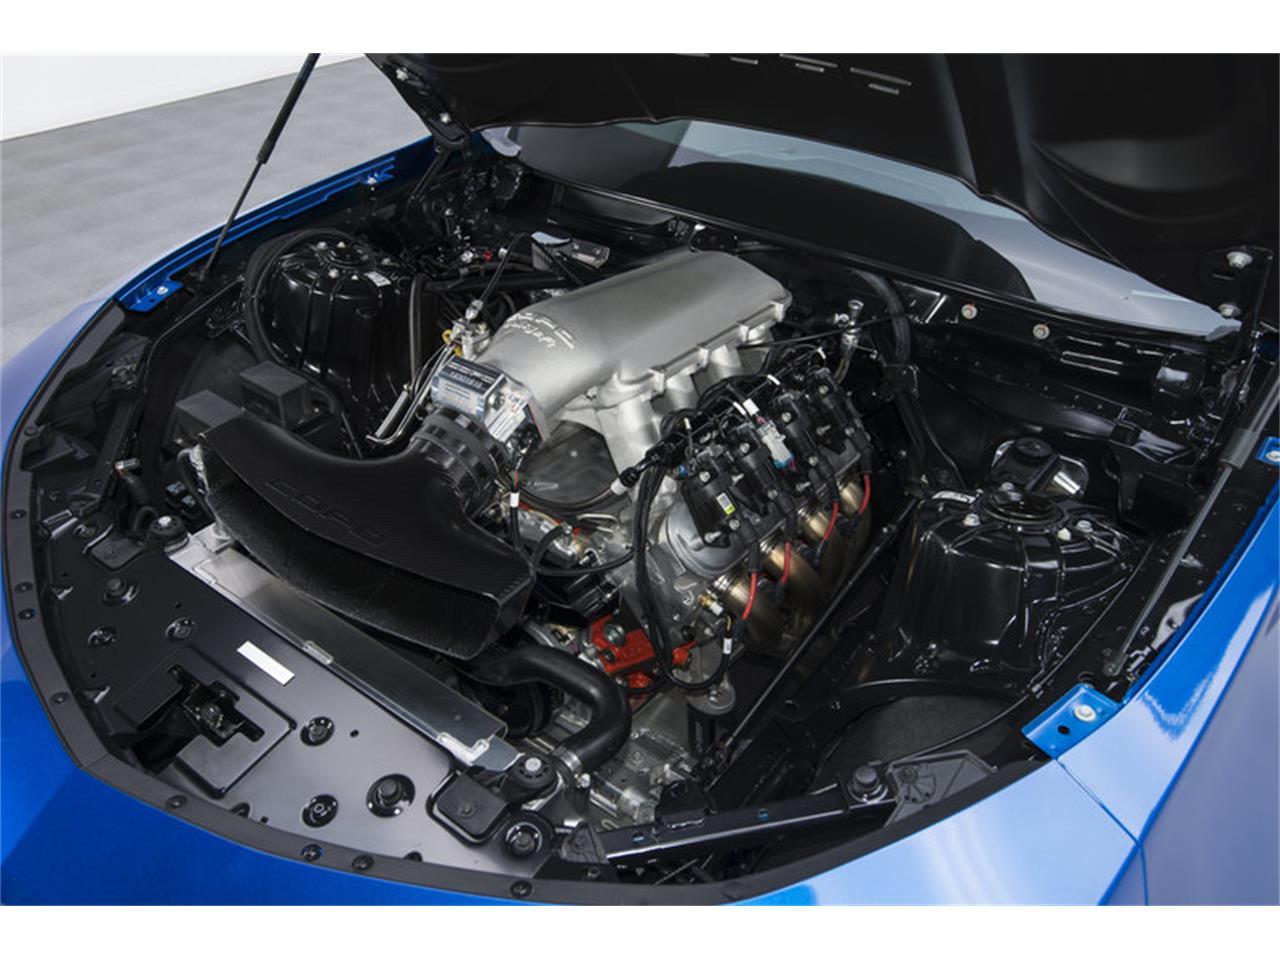 Large Picture of '16 Chevrolet Camaro COPO located in Charlotte North Carolina - $139,900.00 - MFAR